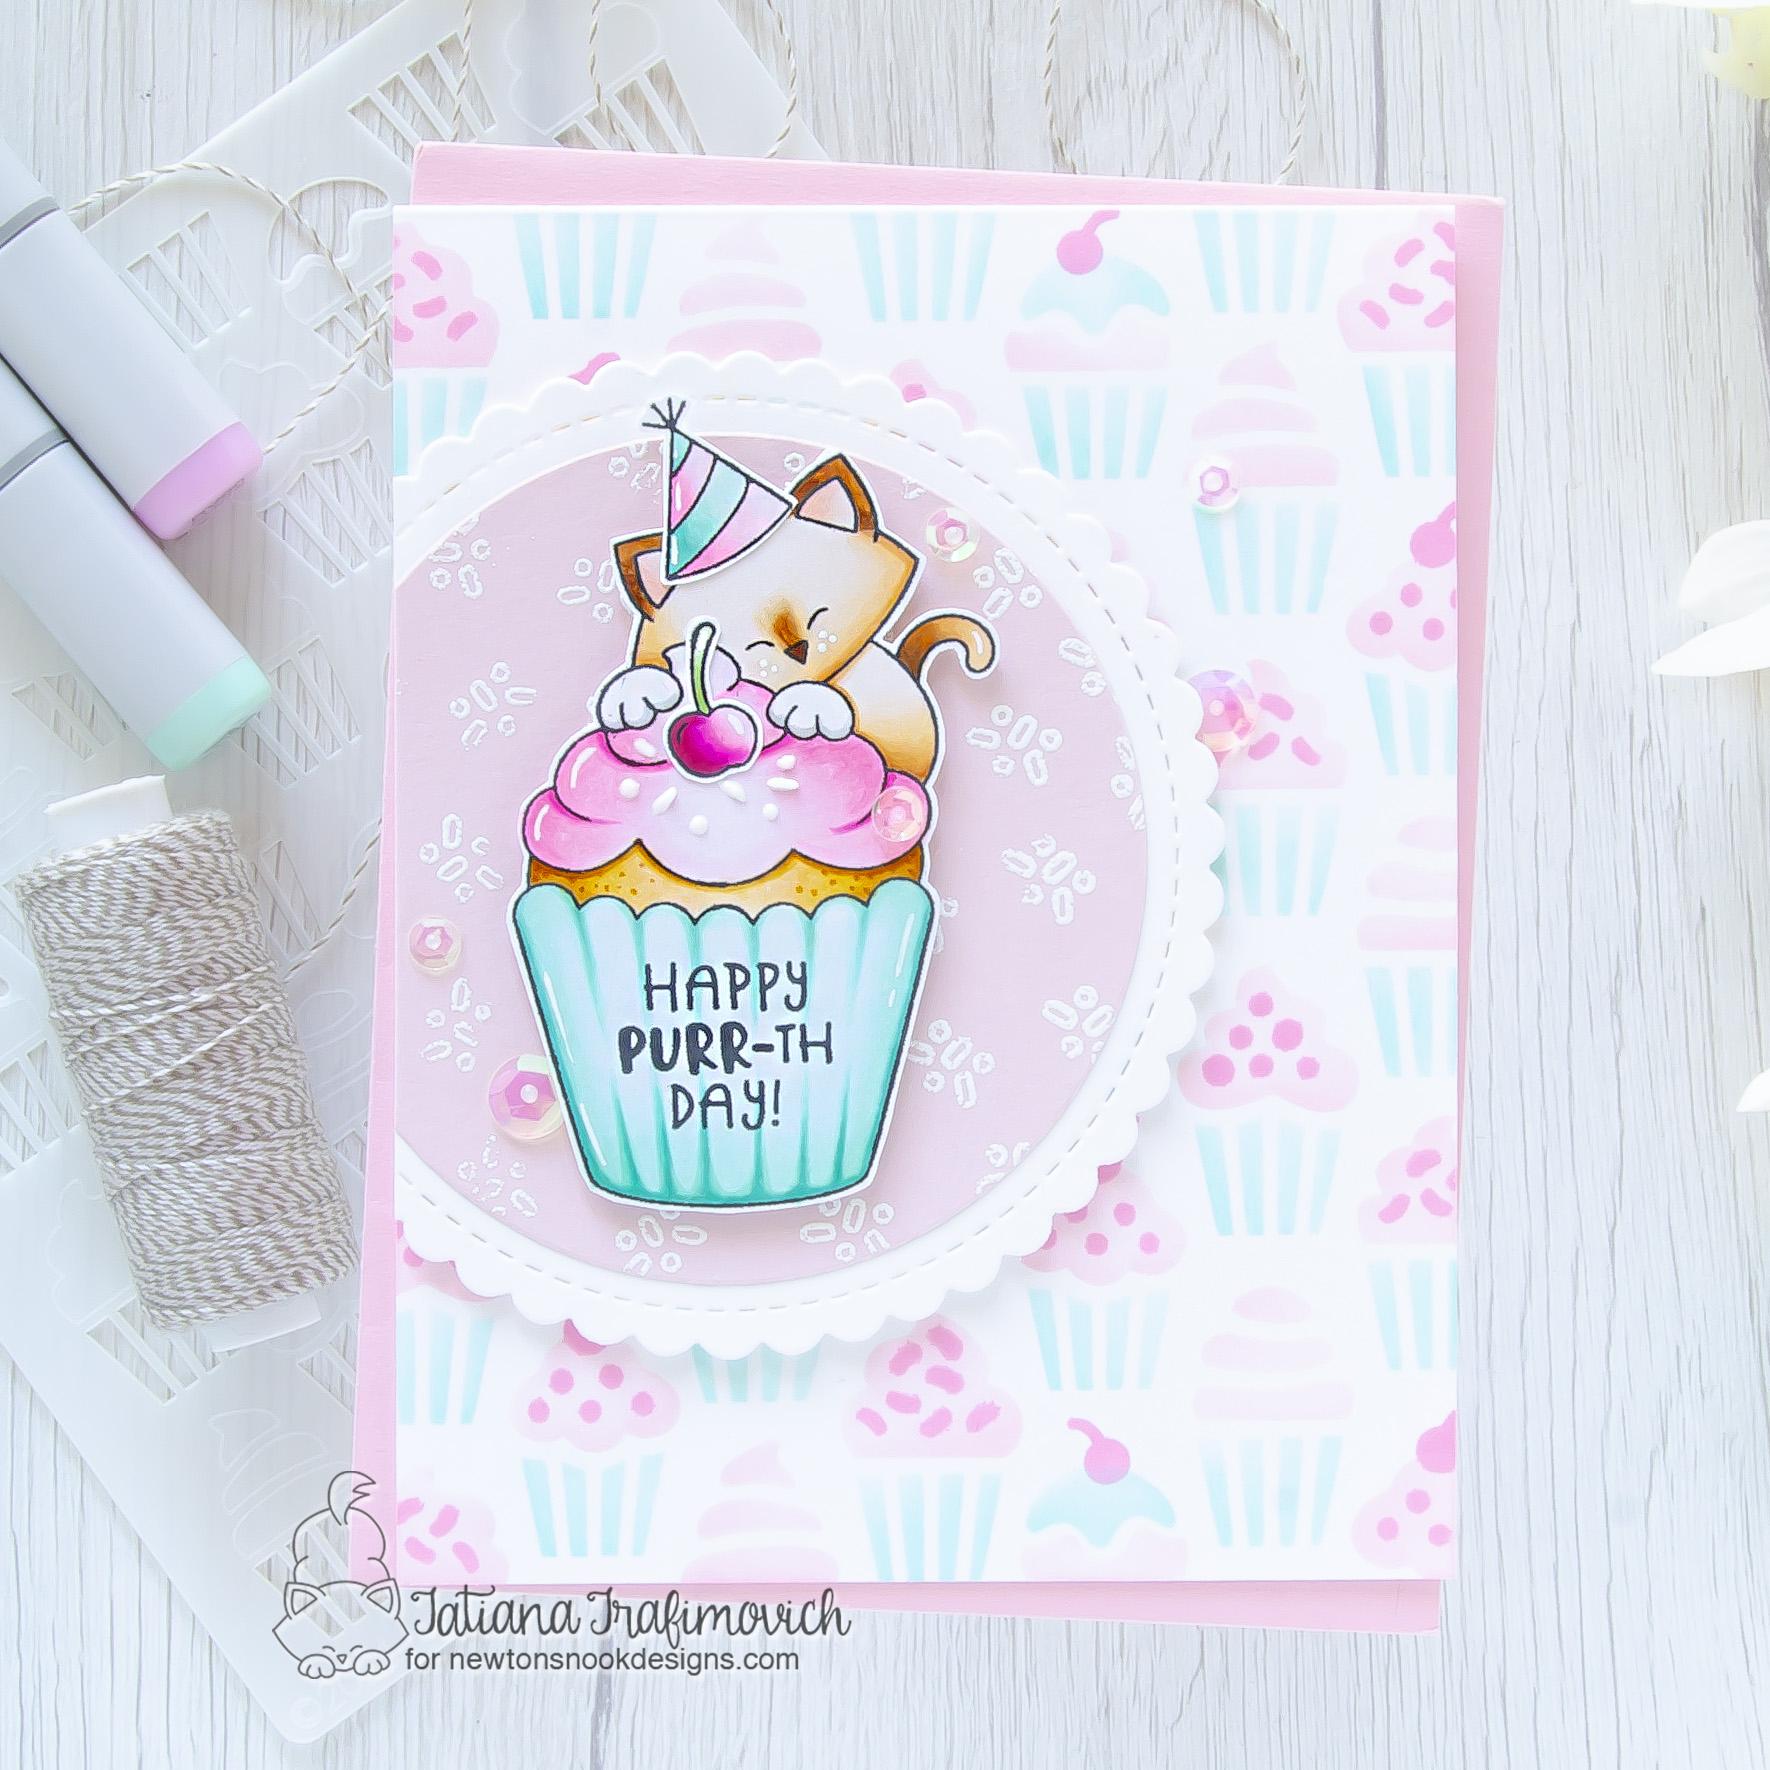 Happy PURR-day!!! #handmade card by Tatiana Trafimovich #tatianacraftandart - Newton's Cupcake stamp set by Newton's Nook Designs #newtonsnook